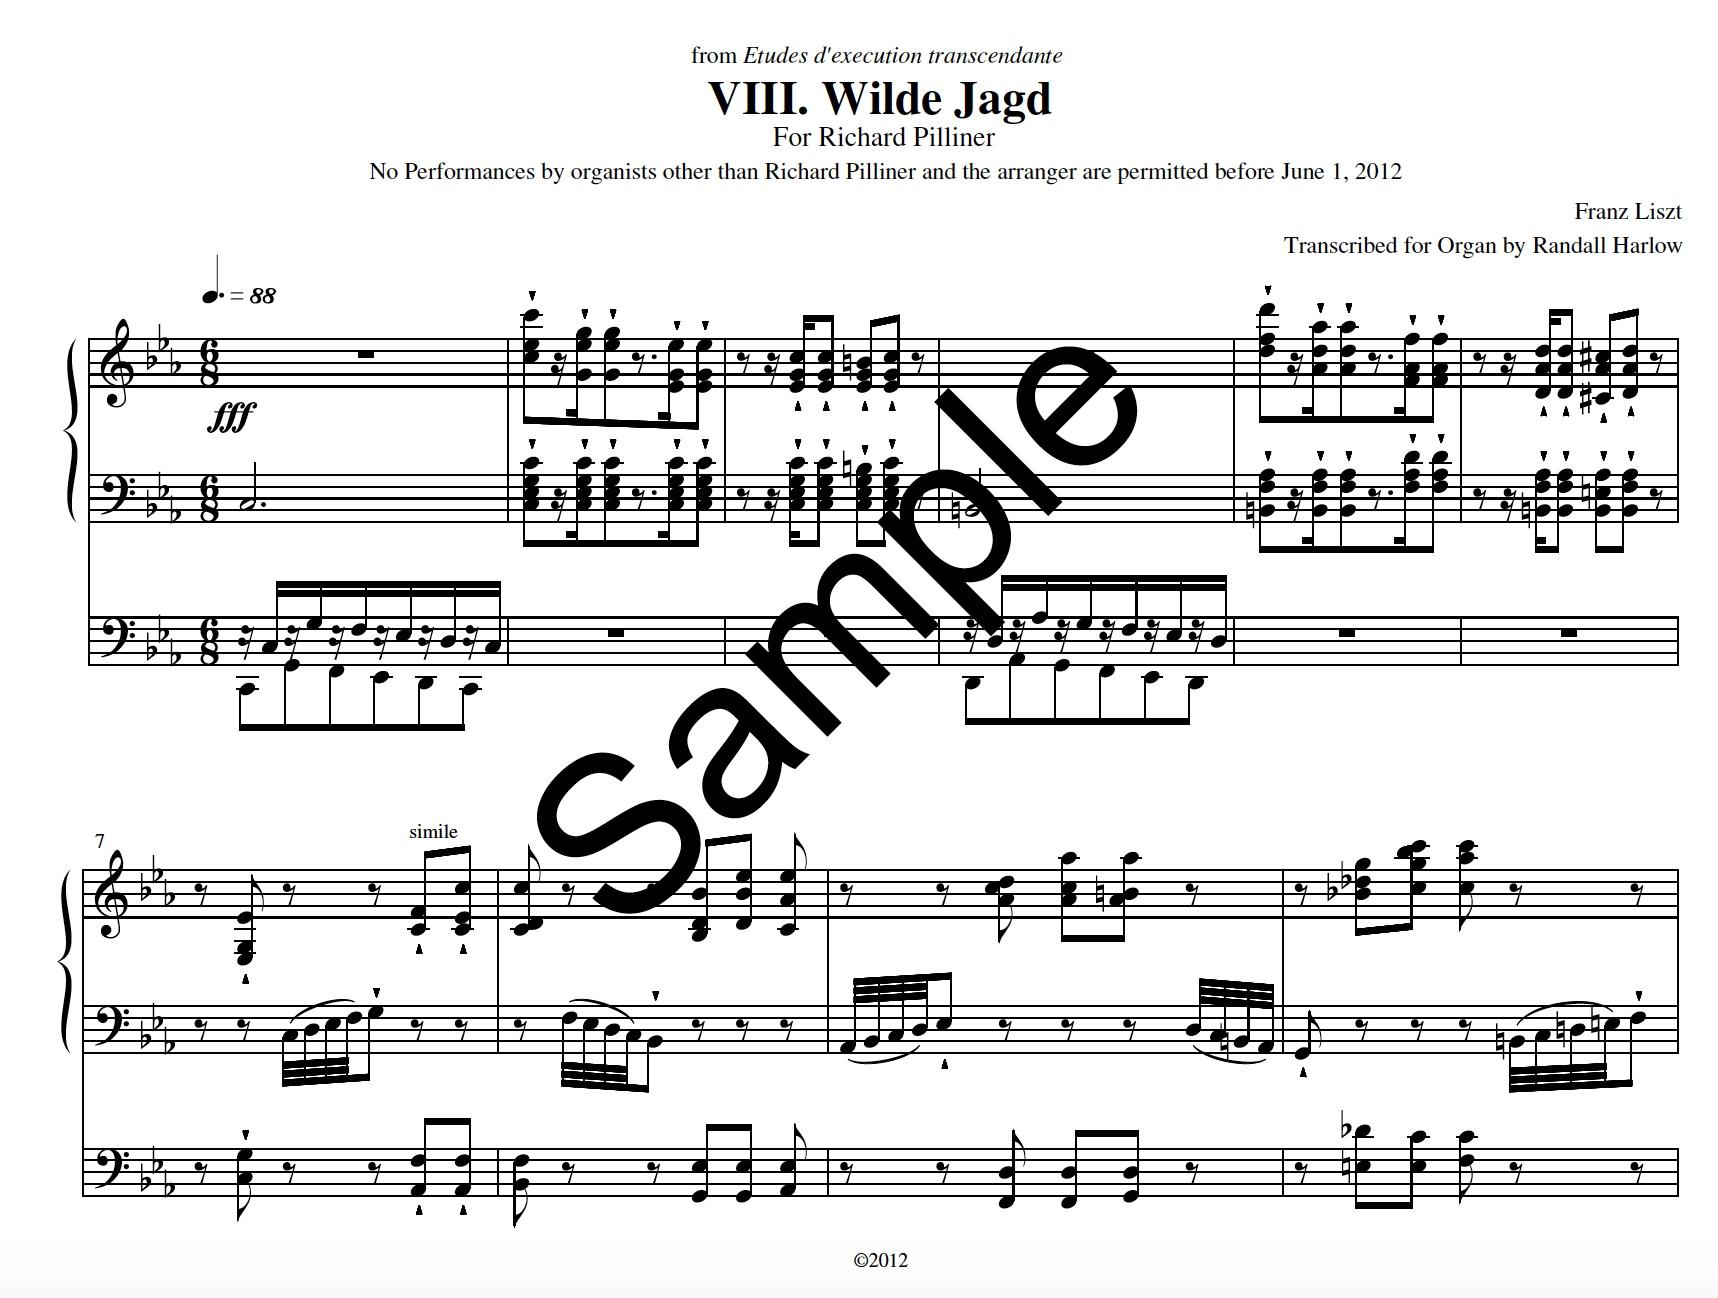 Liszt Transcendental Etudes Wilde Jagd transcribed for organ